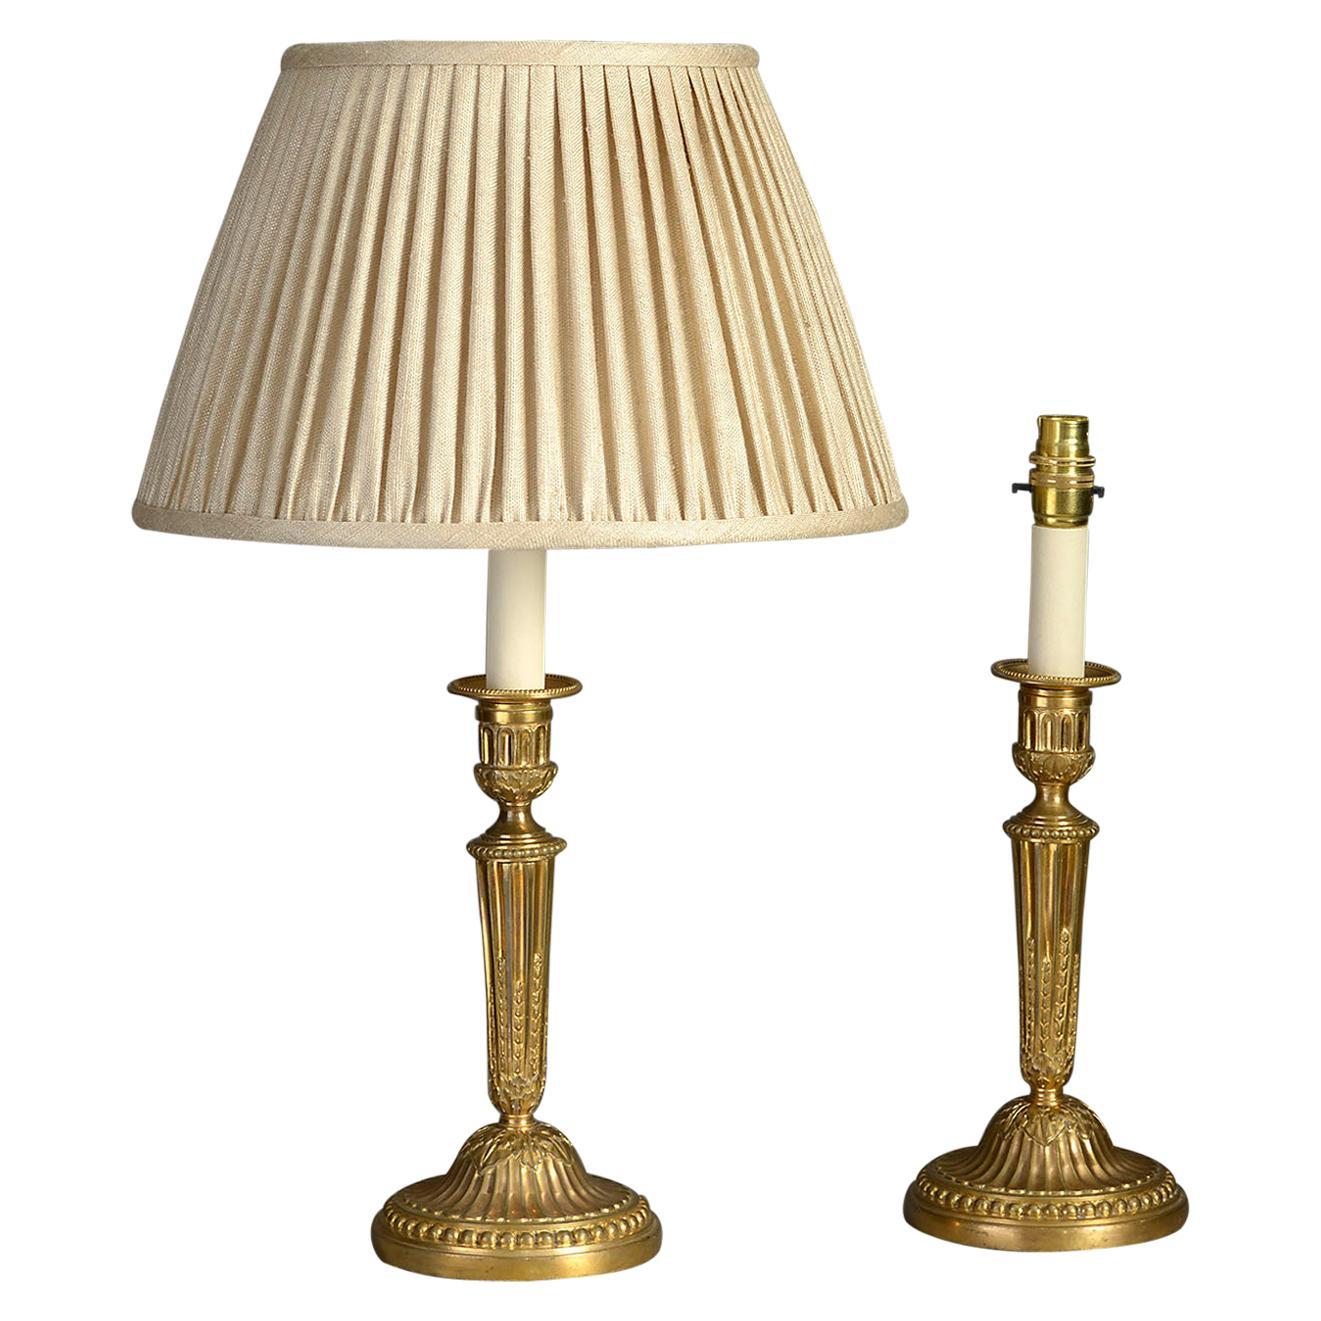 Pair of 18th Century Louis XVI Period Ormolu Candlestick Lamps